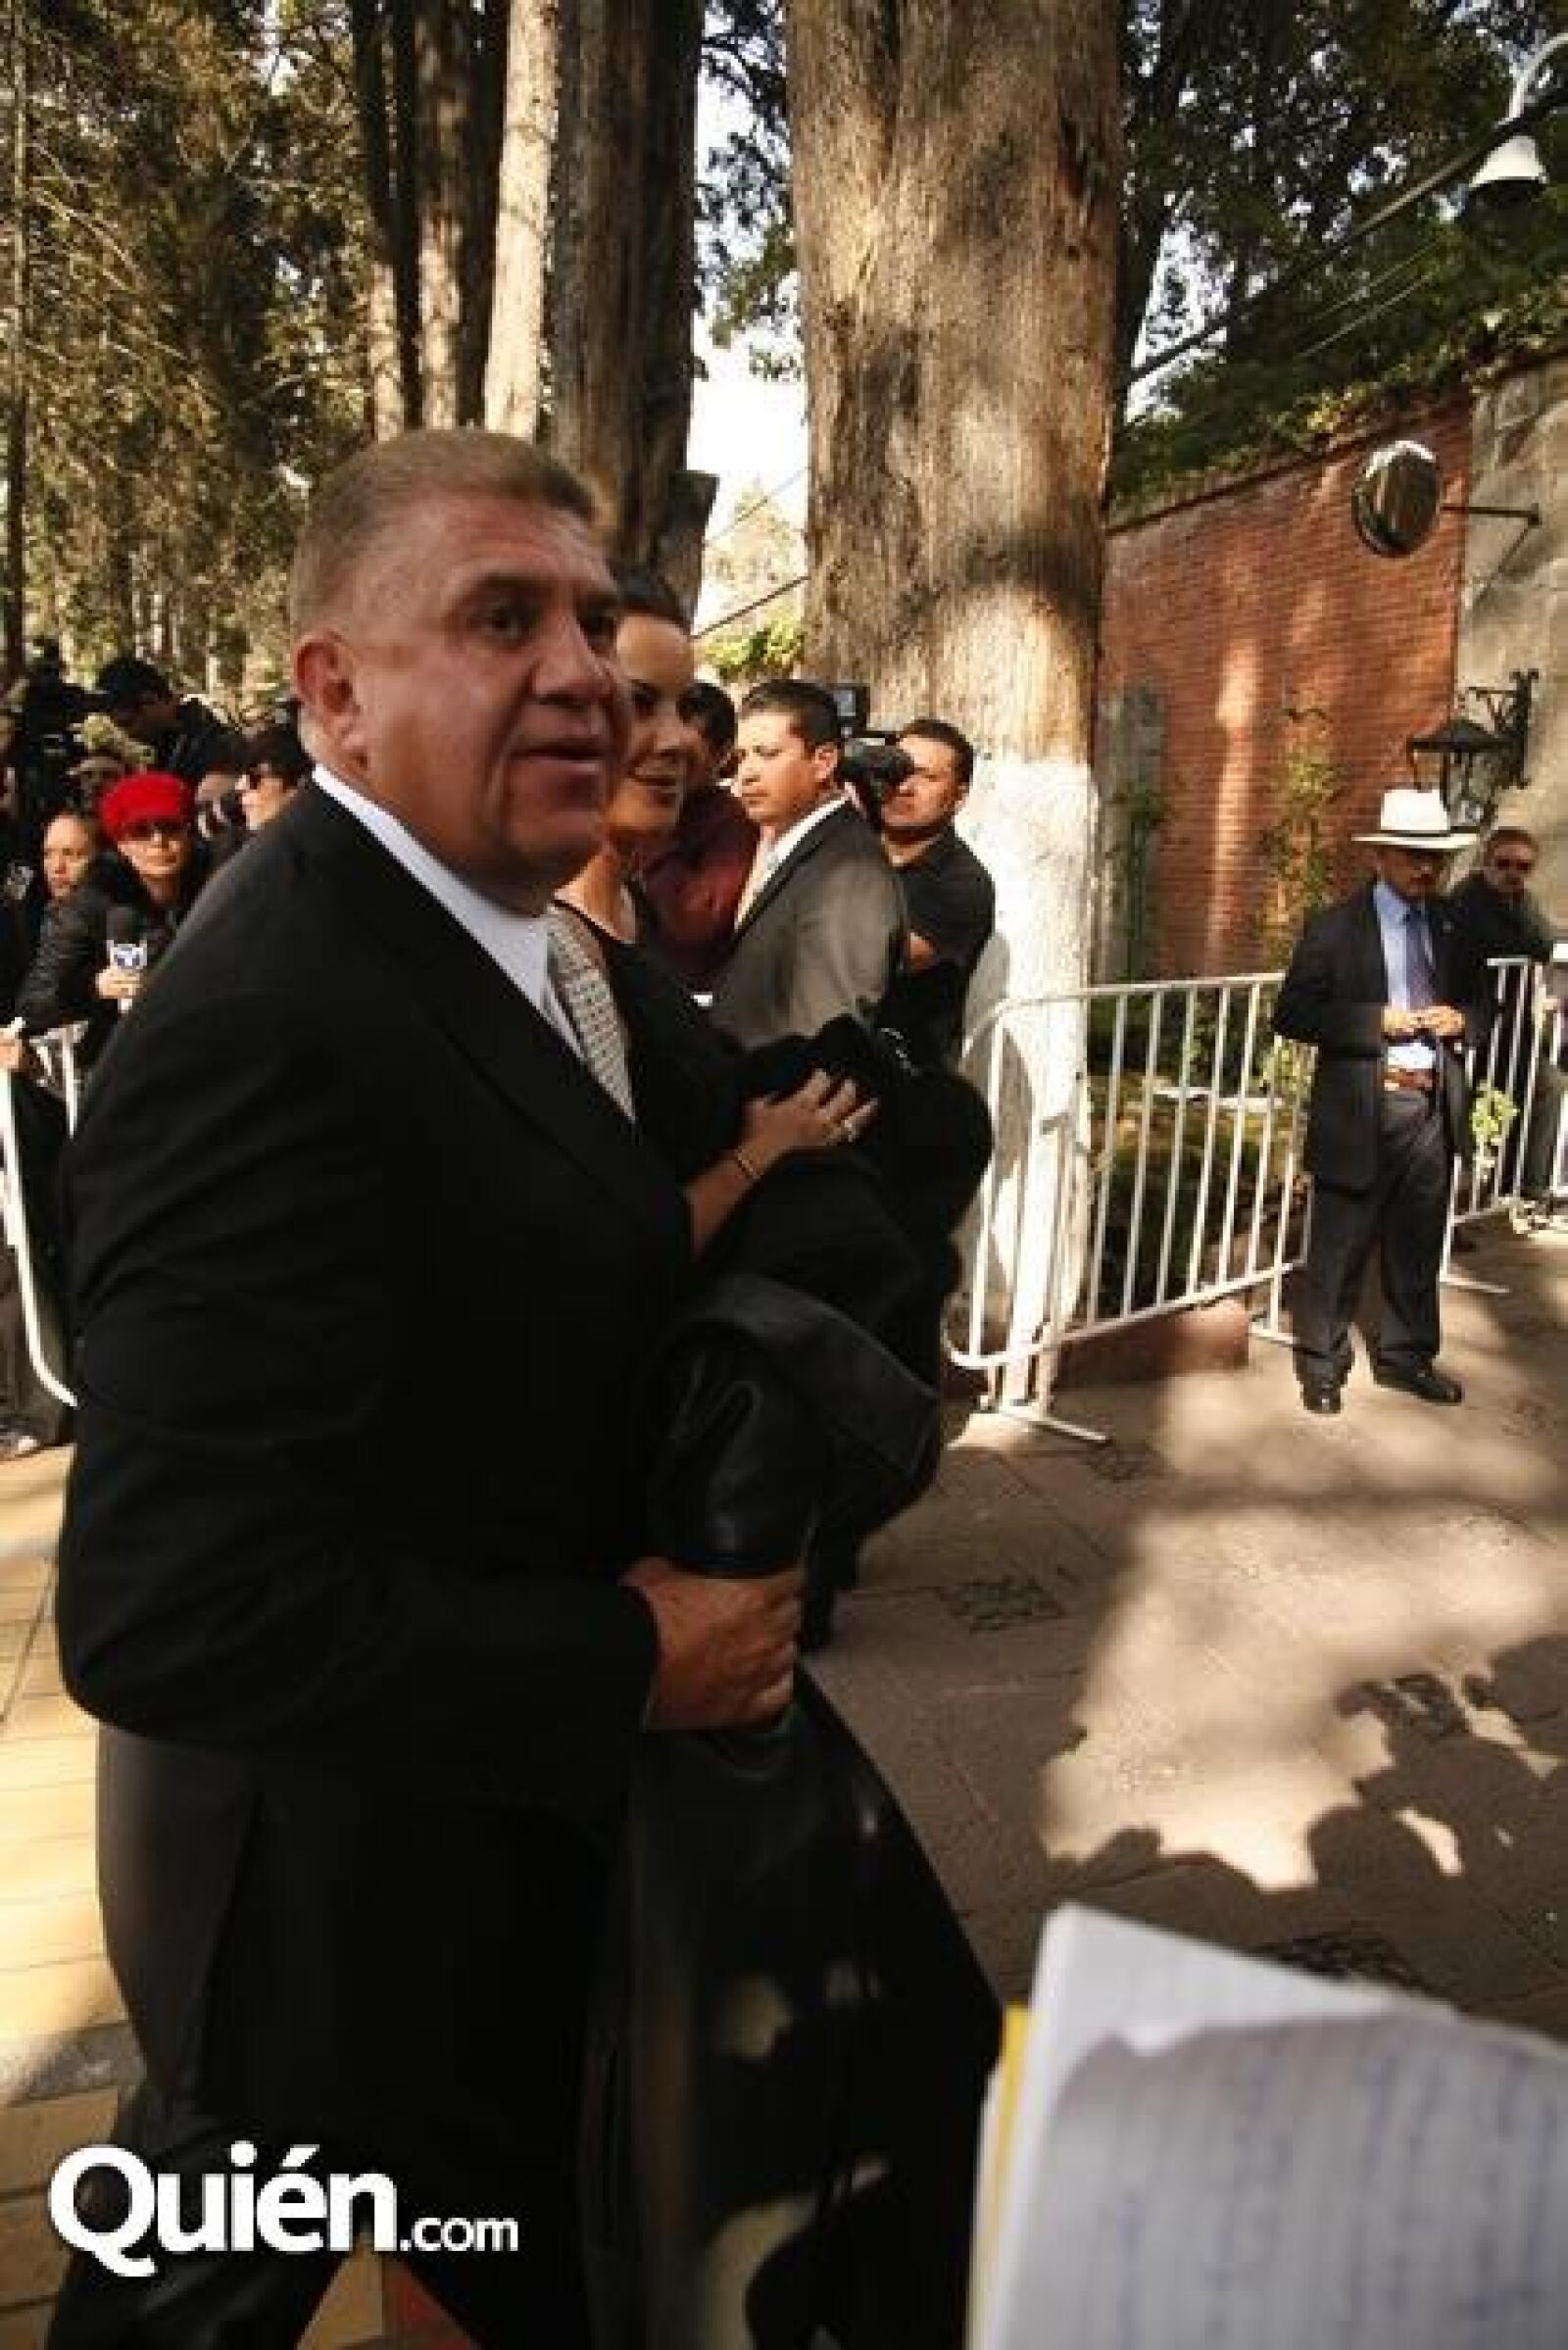 José Manzur Quiroga